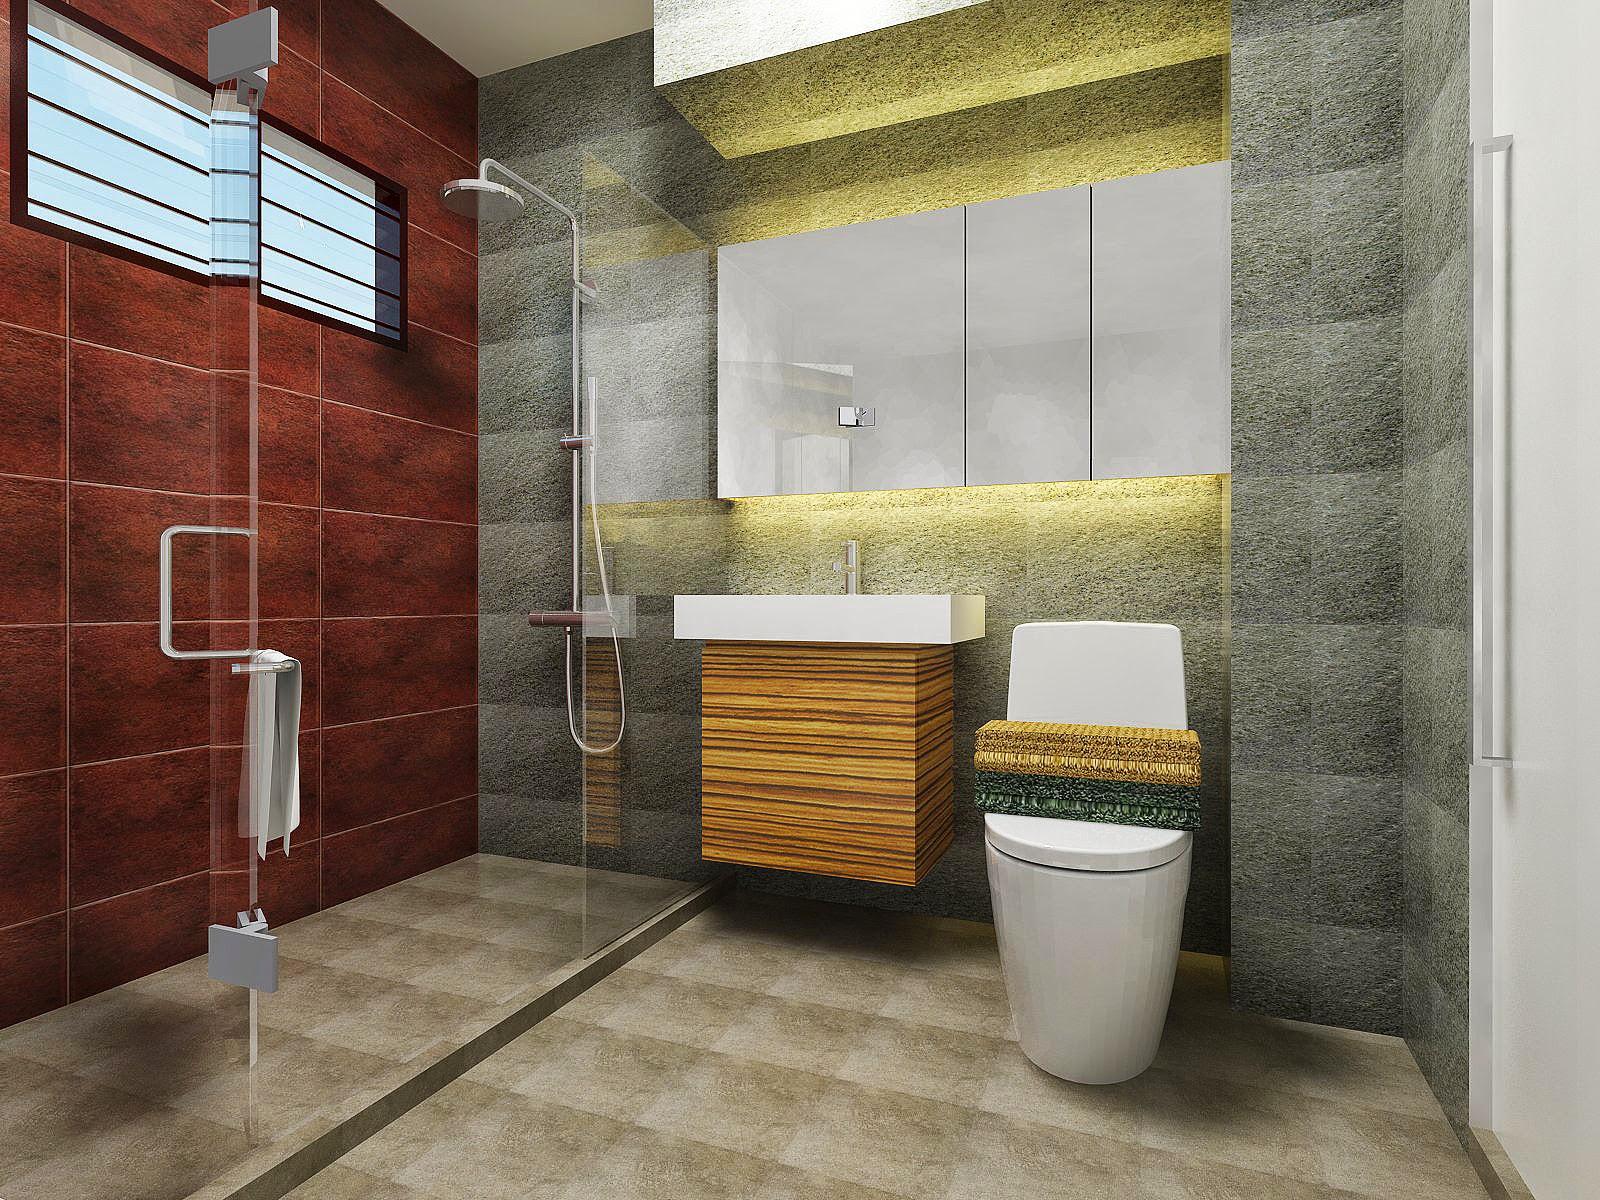 Hdb kitchen and bathroom design freelance interior for Bathroom design simulator